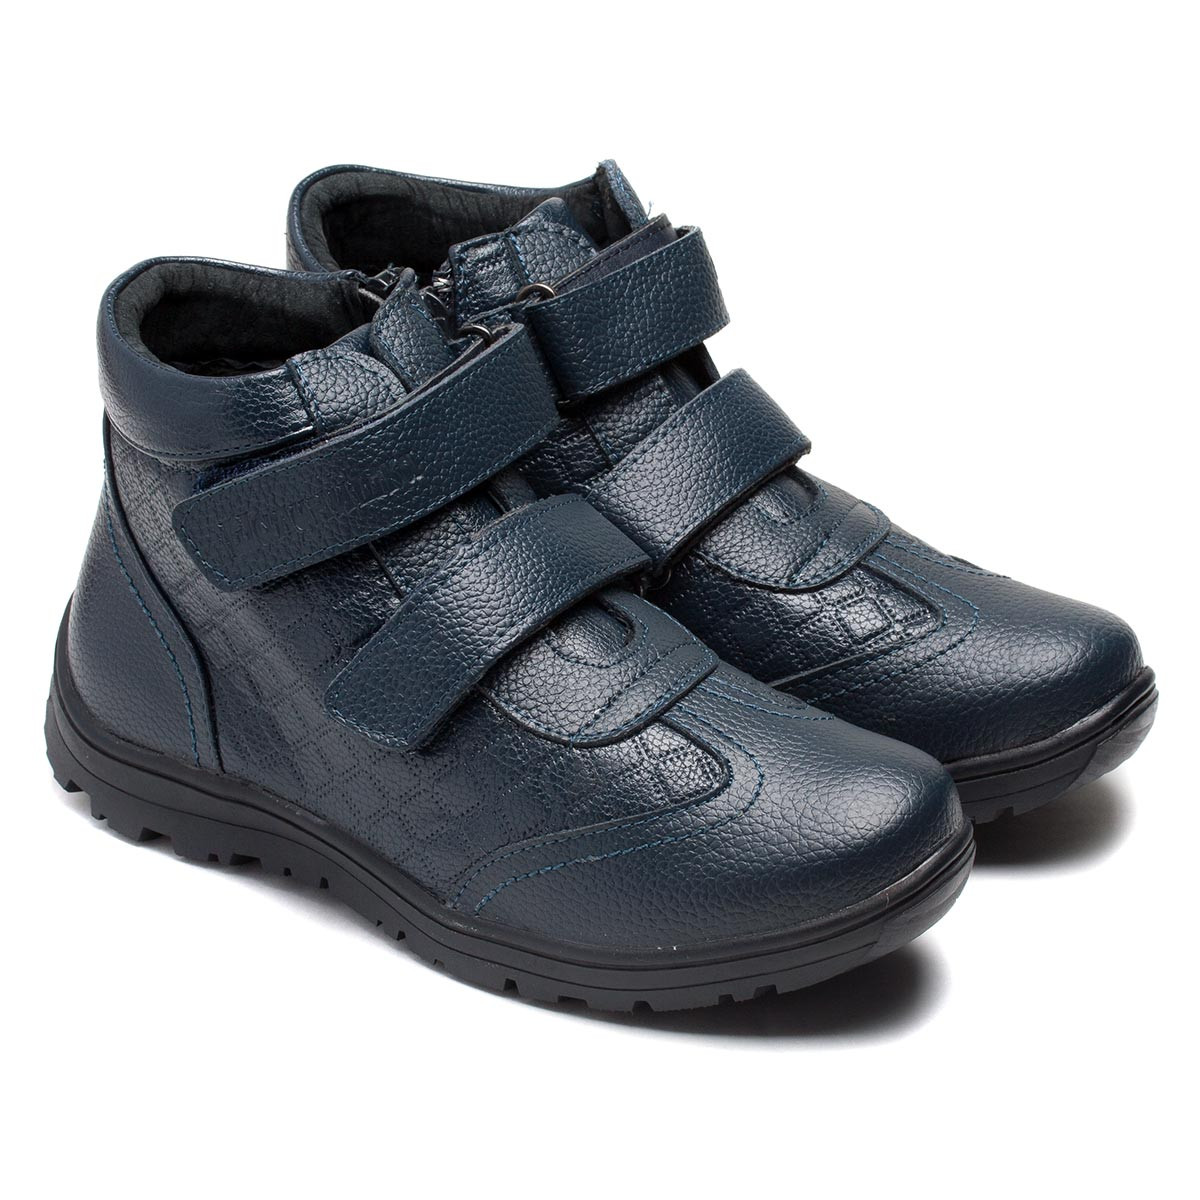 Ботинки Шалунишка - Ортопед  для мальчика, на липучках и молнии, размер 32-37